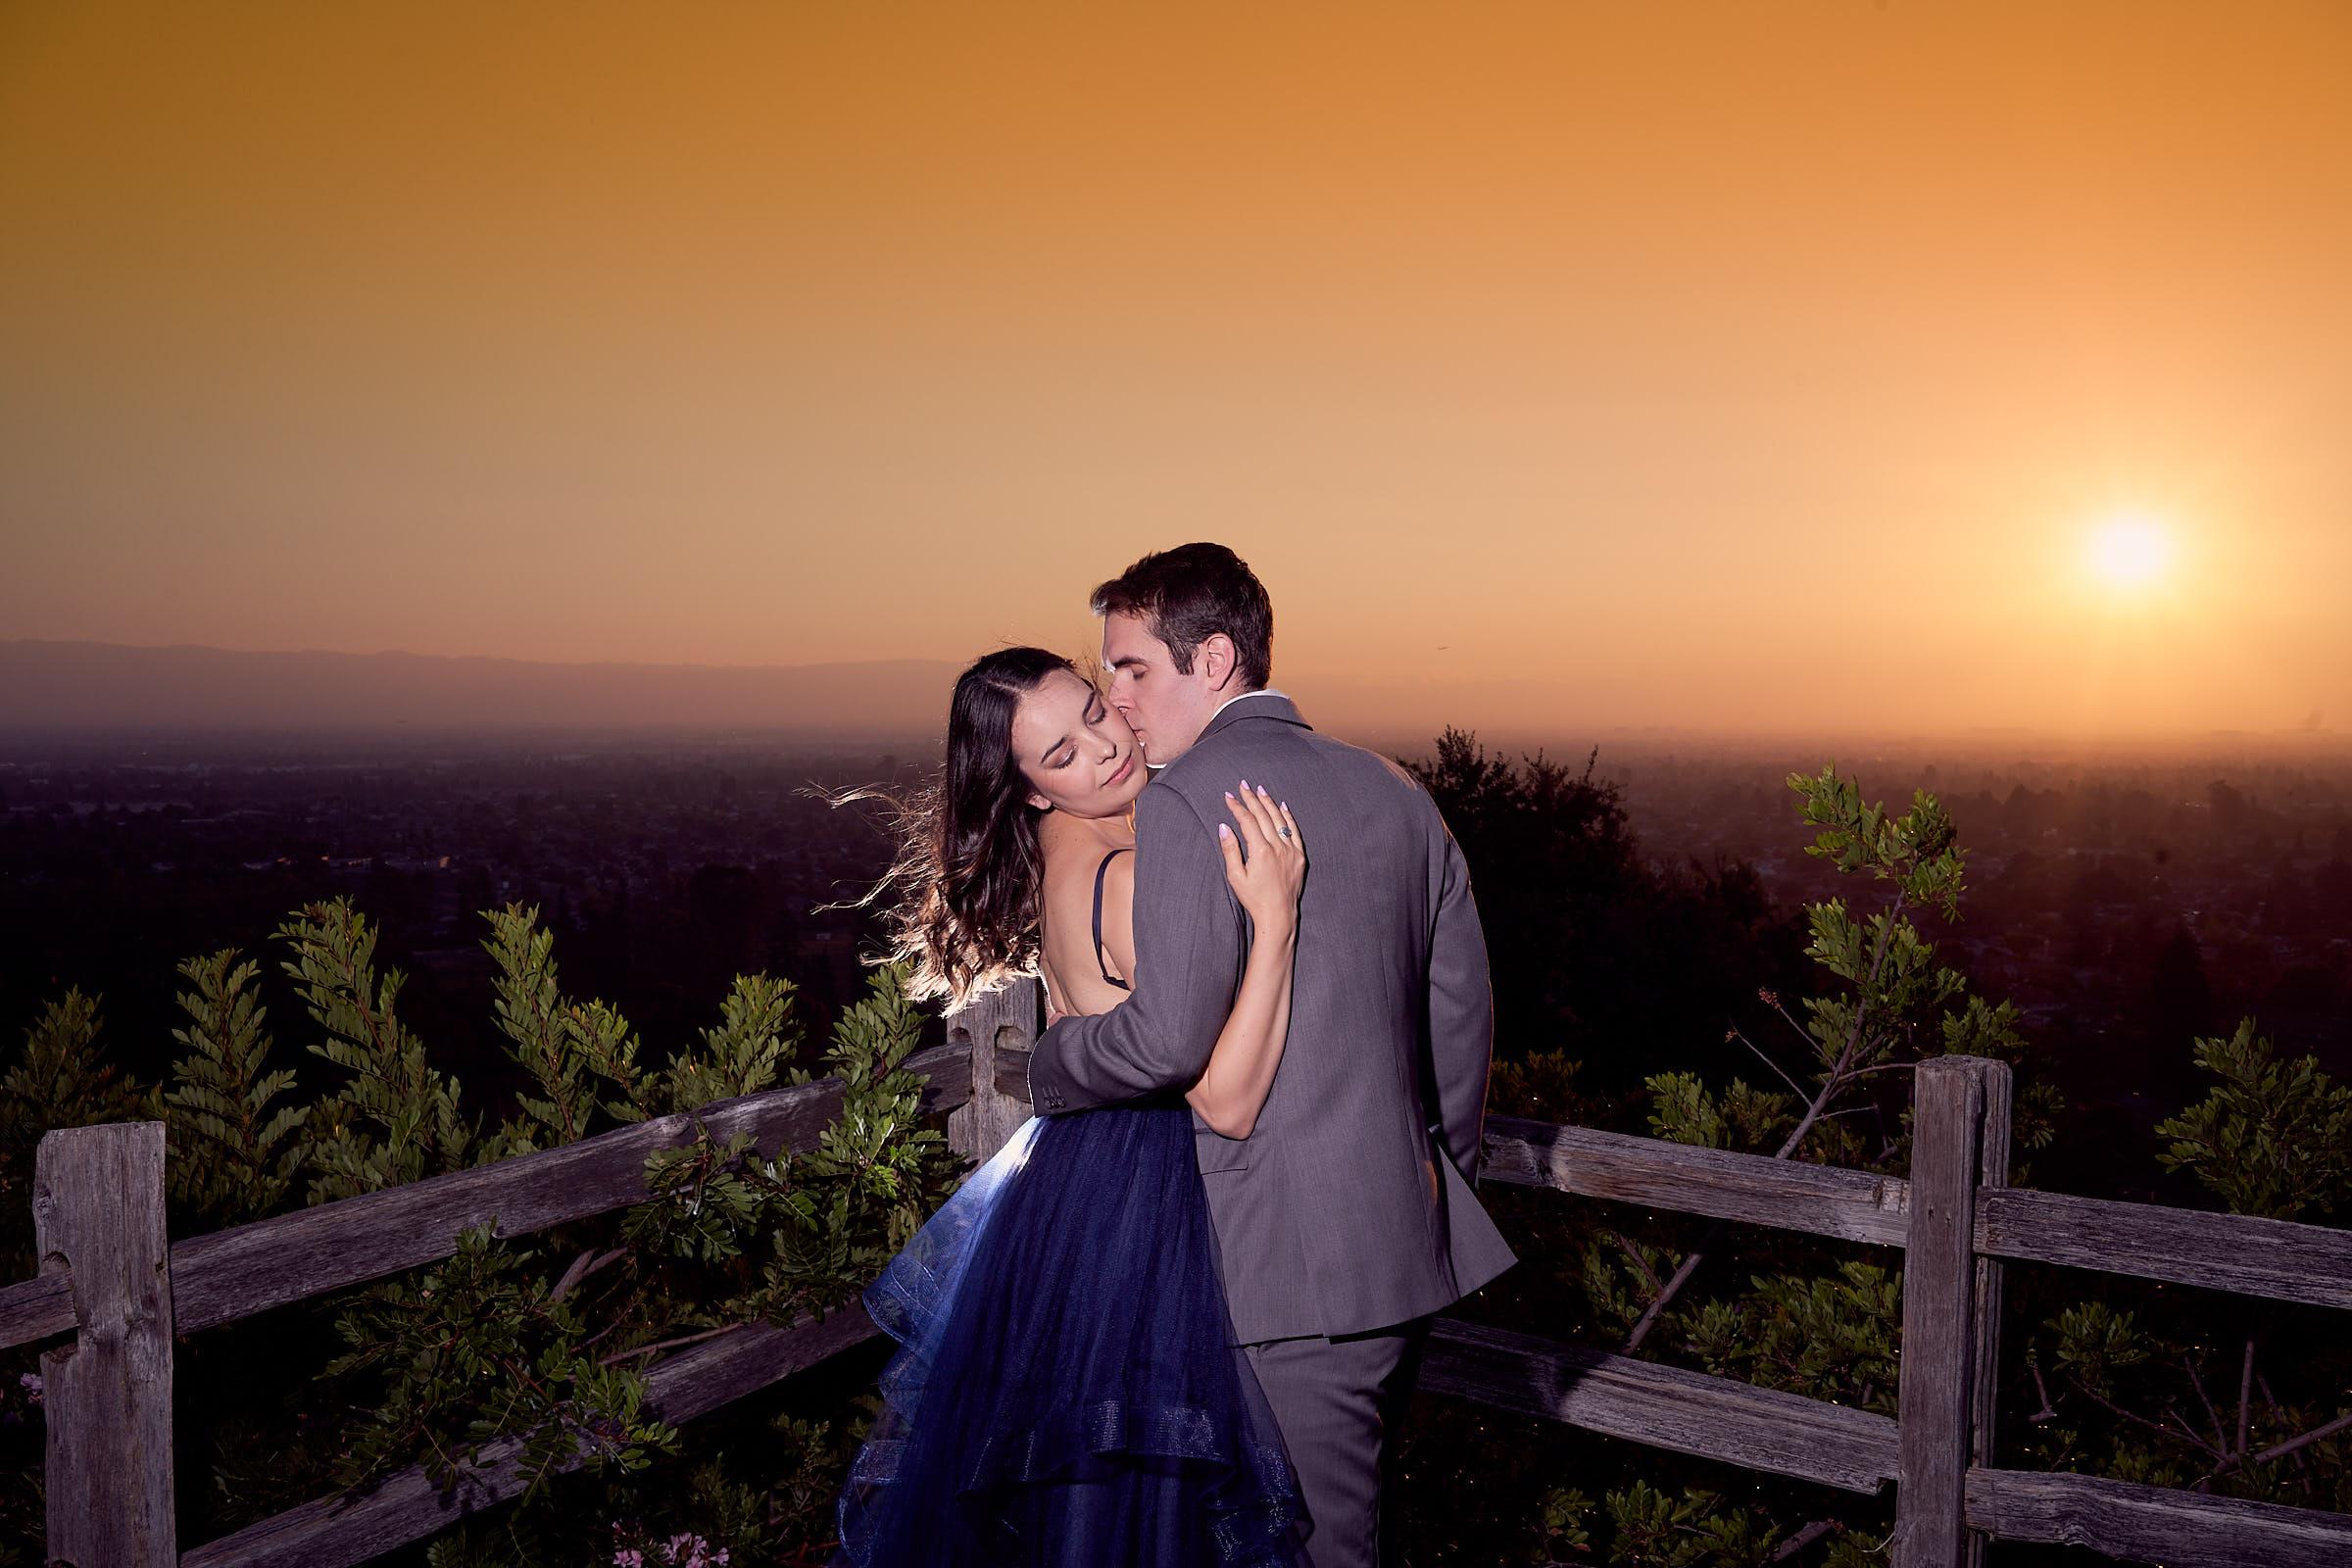 Sunset Time Couples Photoshoot Palo Alto Bay Area